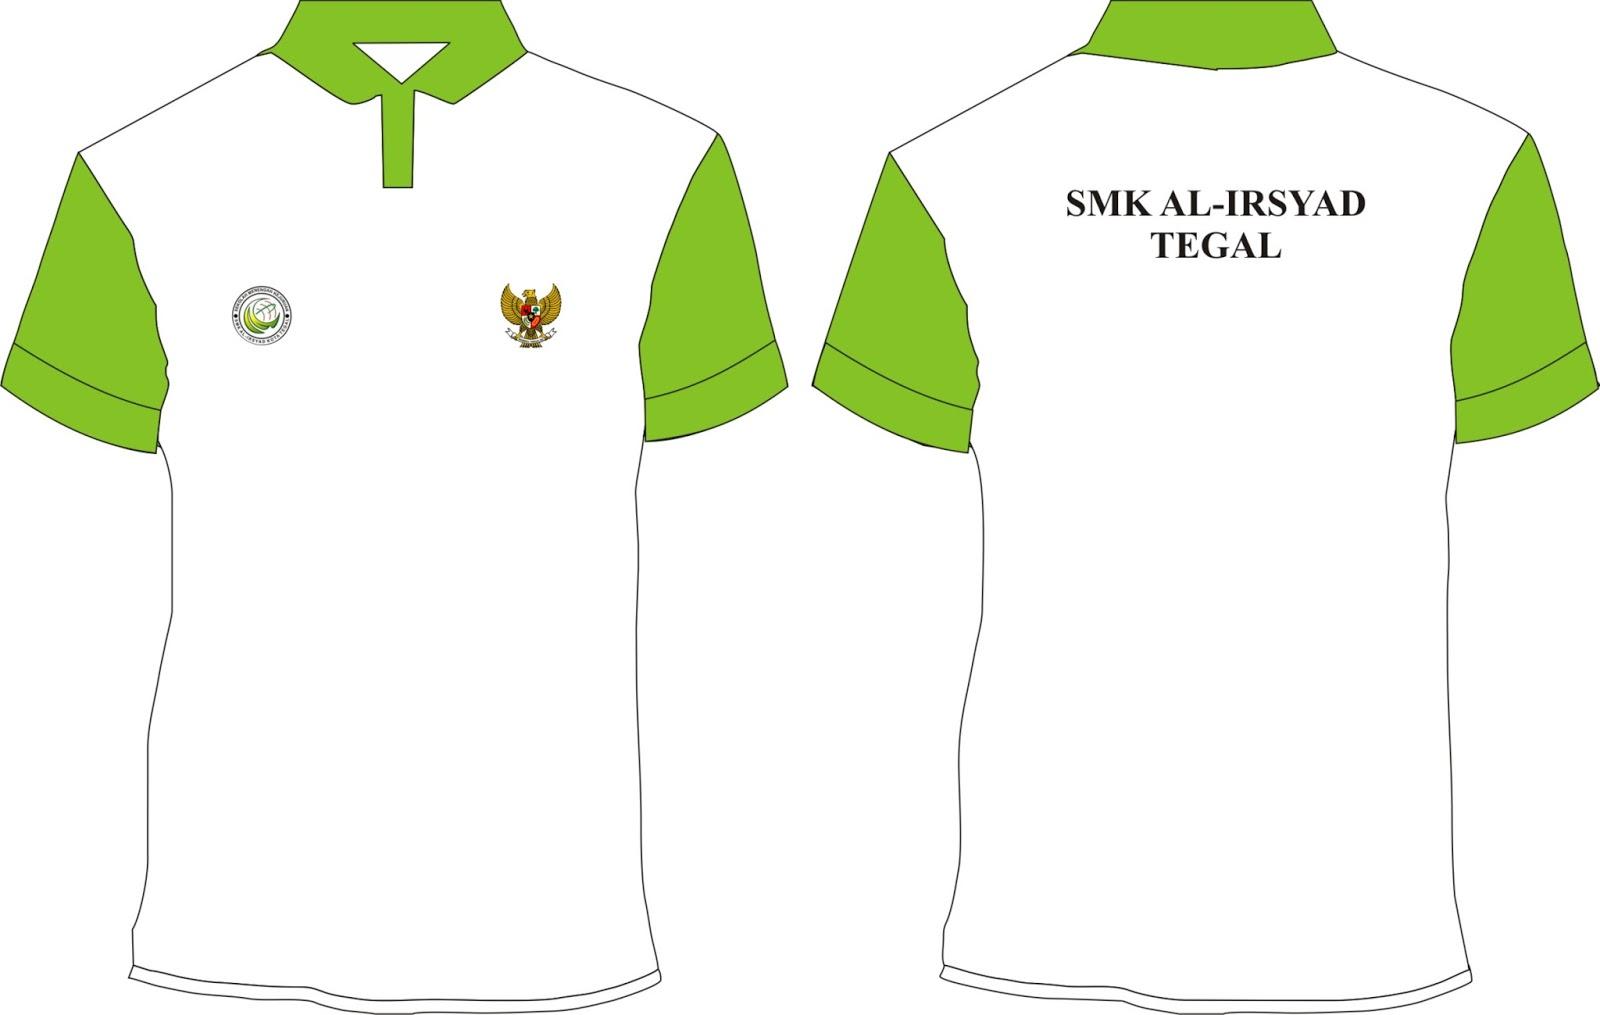 ... Download Contoh Desain Kaos Olahraga Jalan Santai Sekolah CDR Gratis